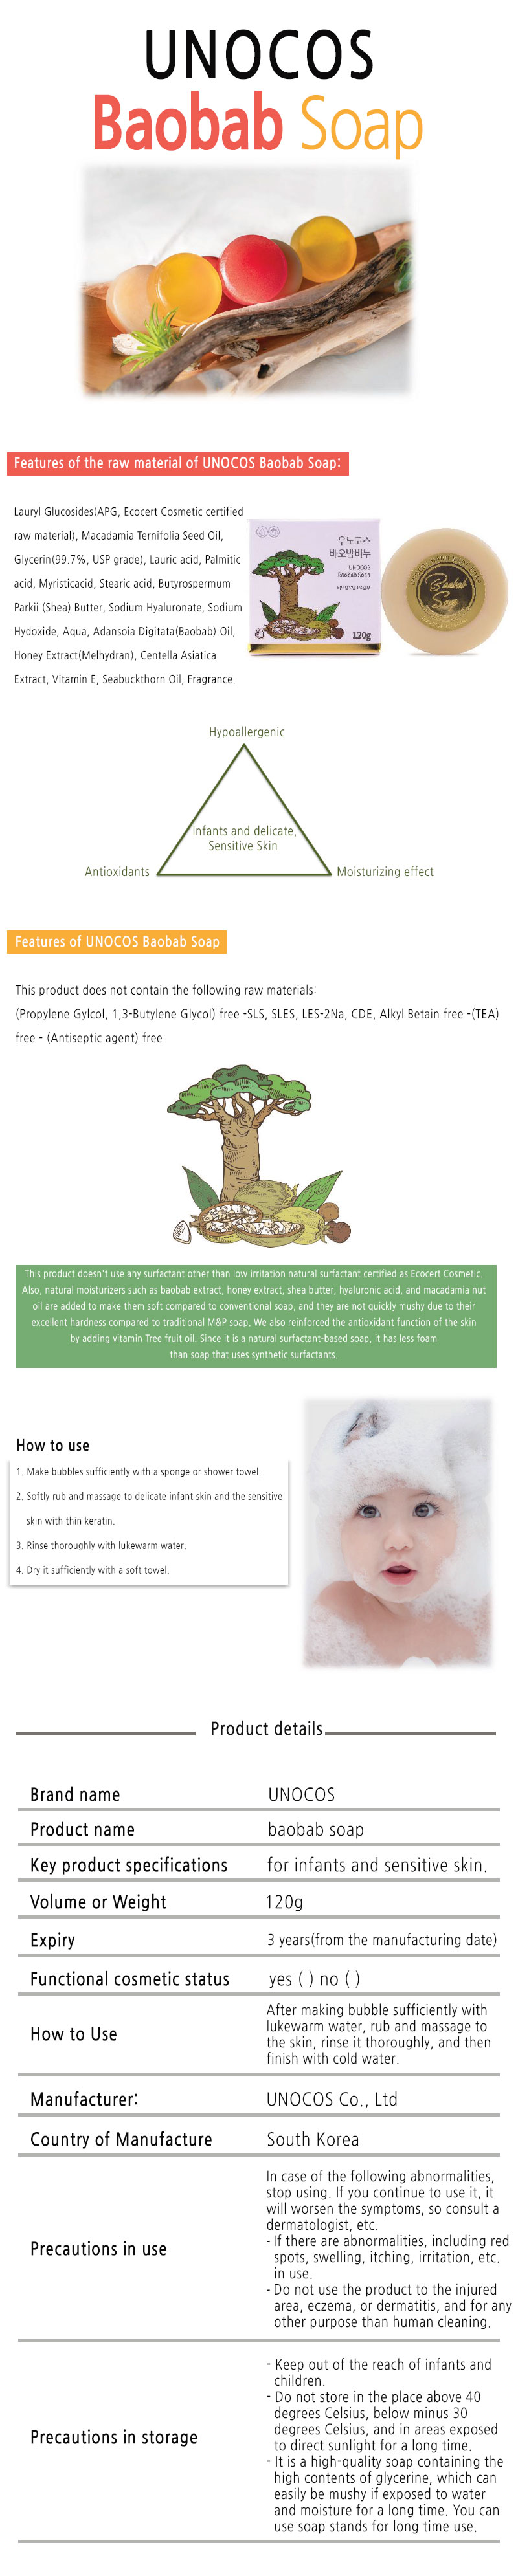 Baobap Soap